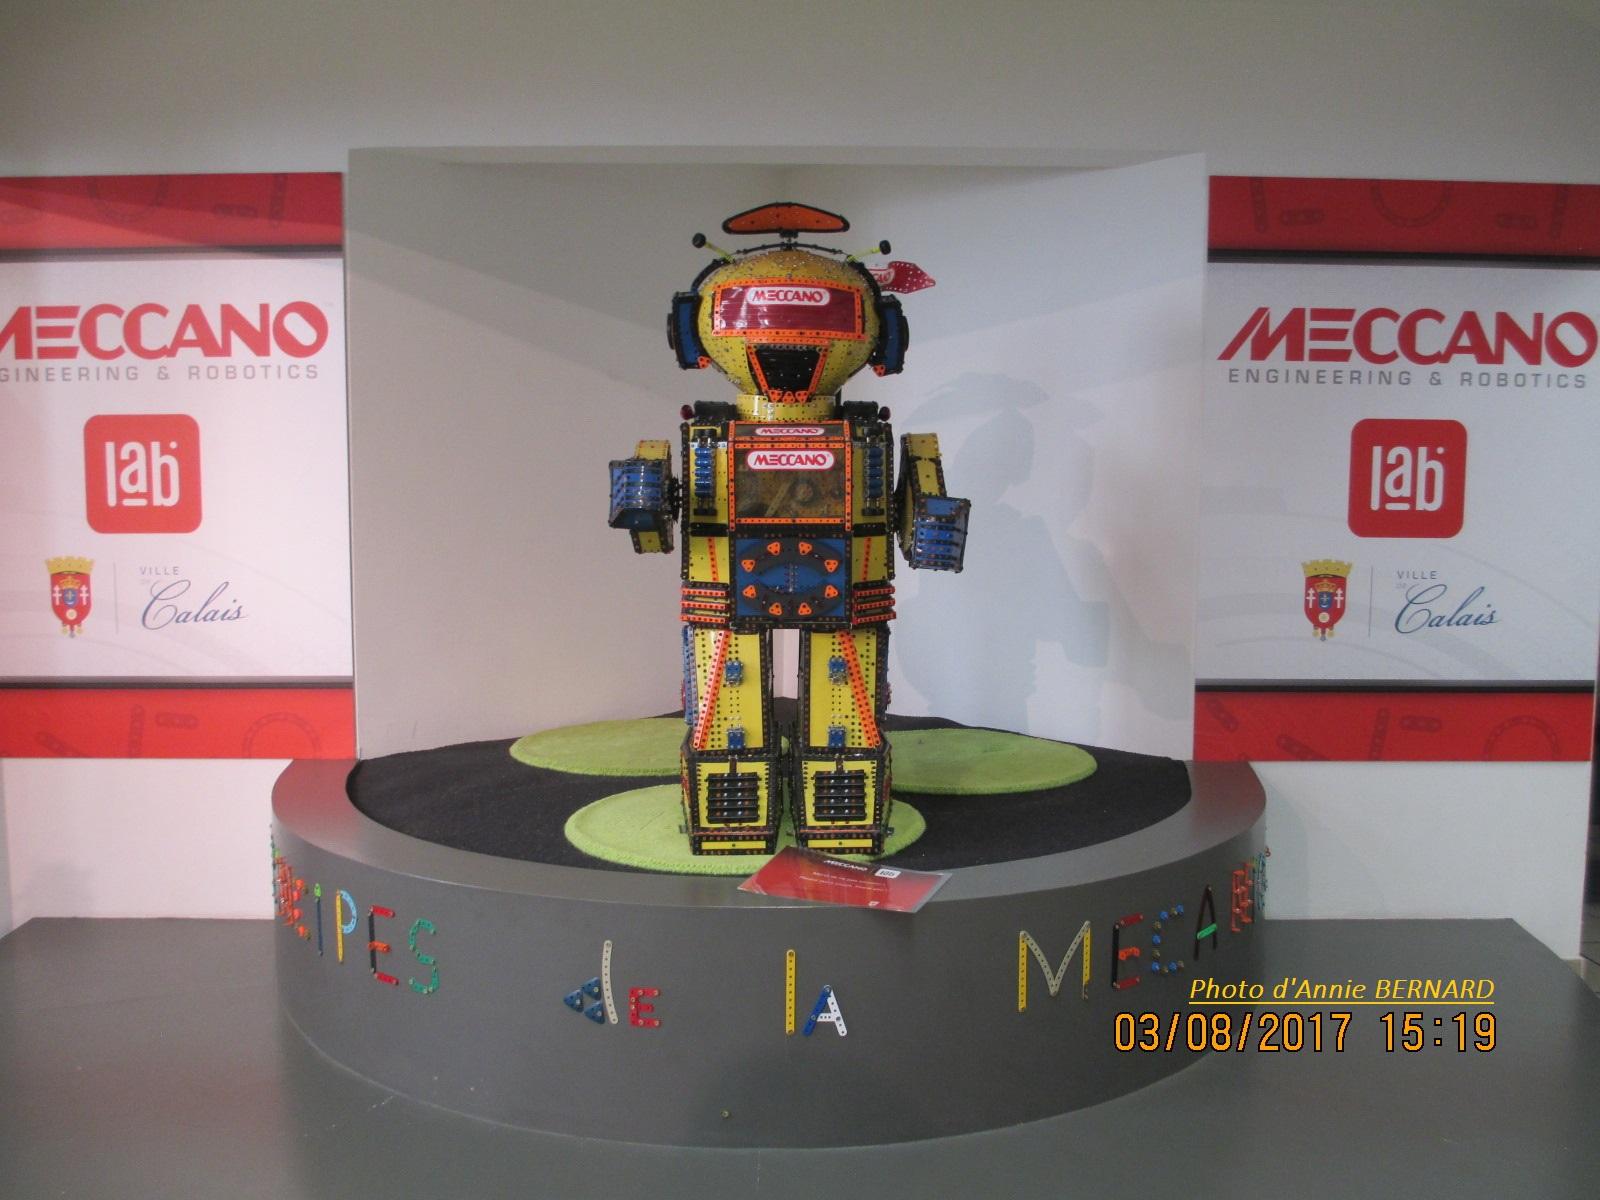 Meccano Lab à Calais